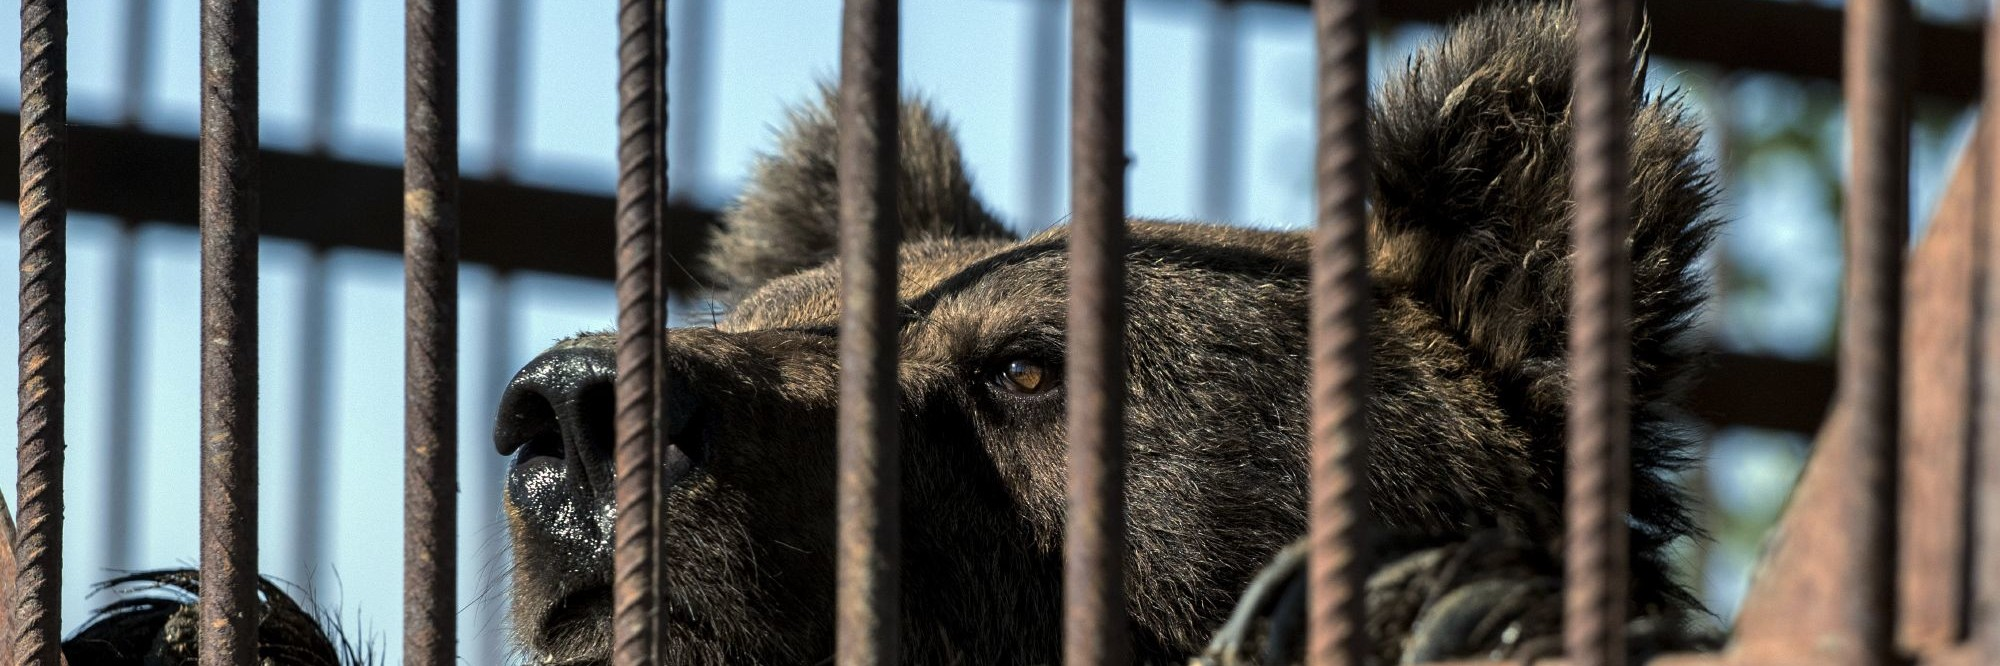 BEARS in Serbia